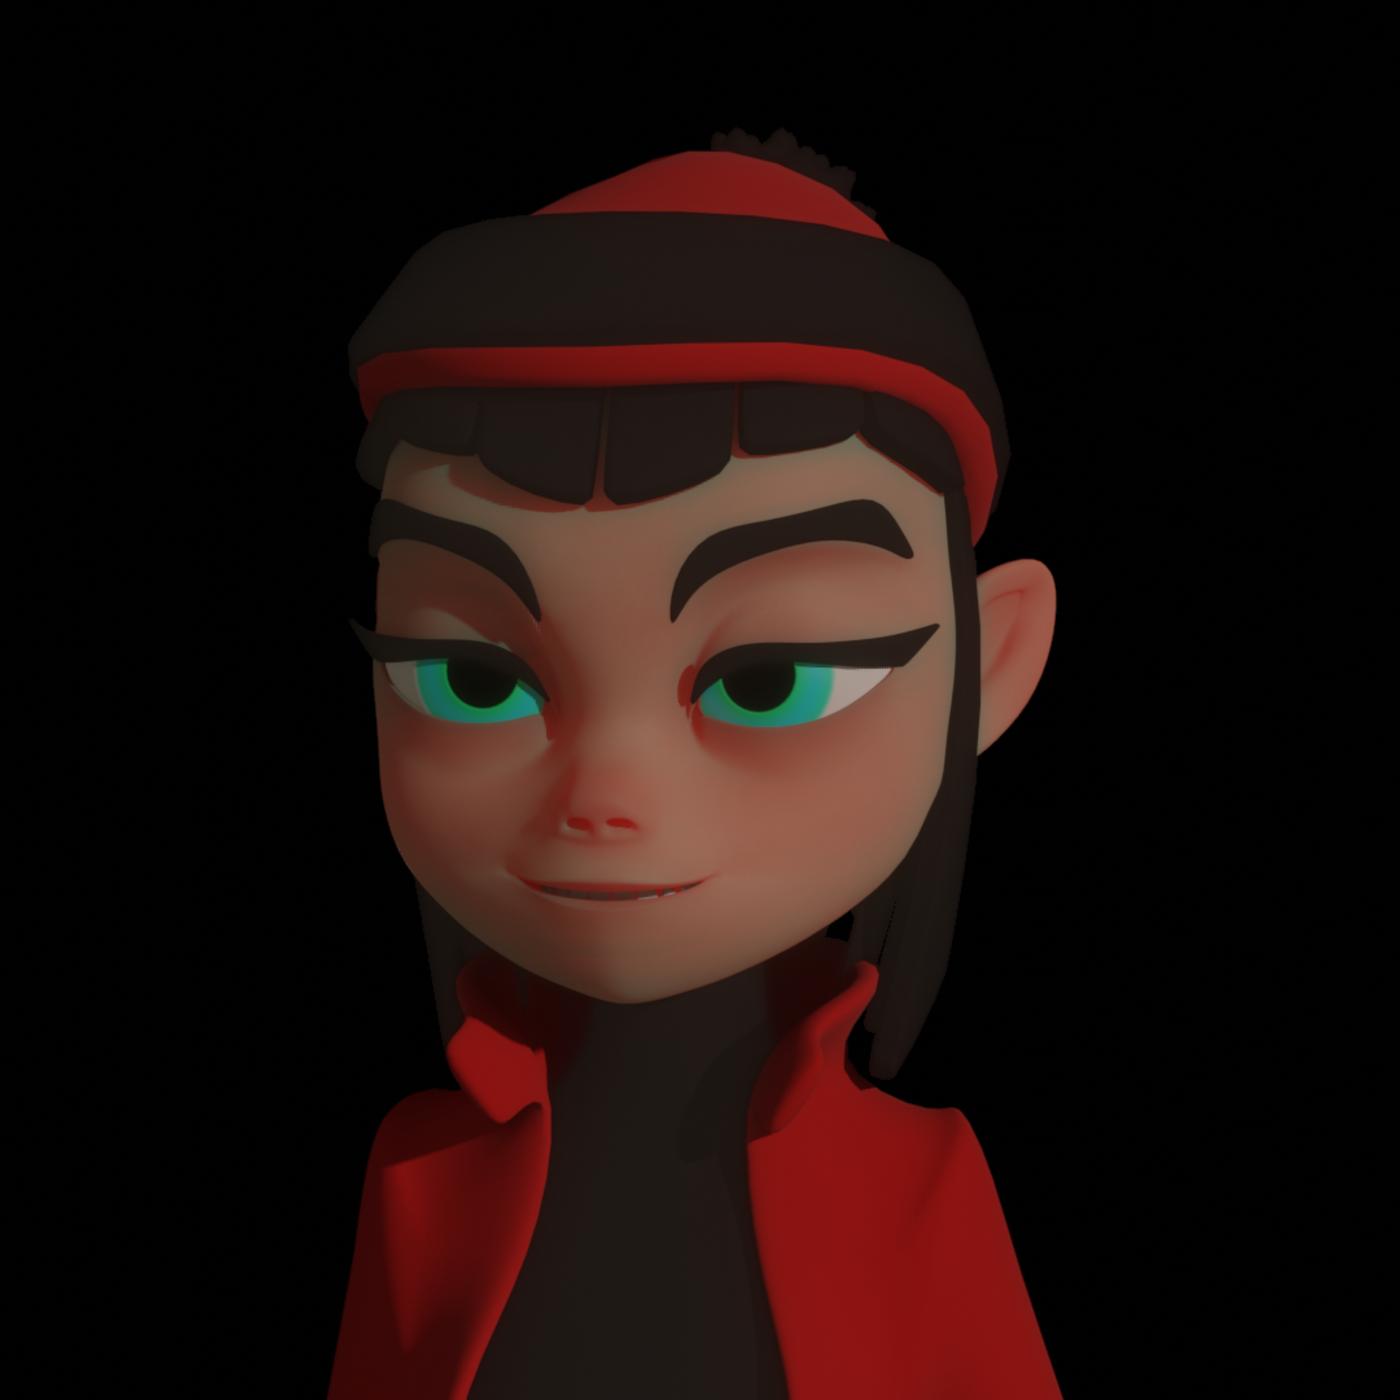 Female Cartoon Character